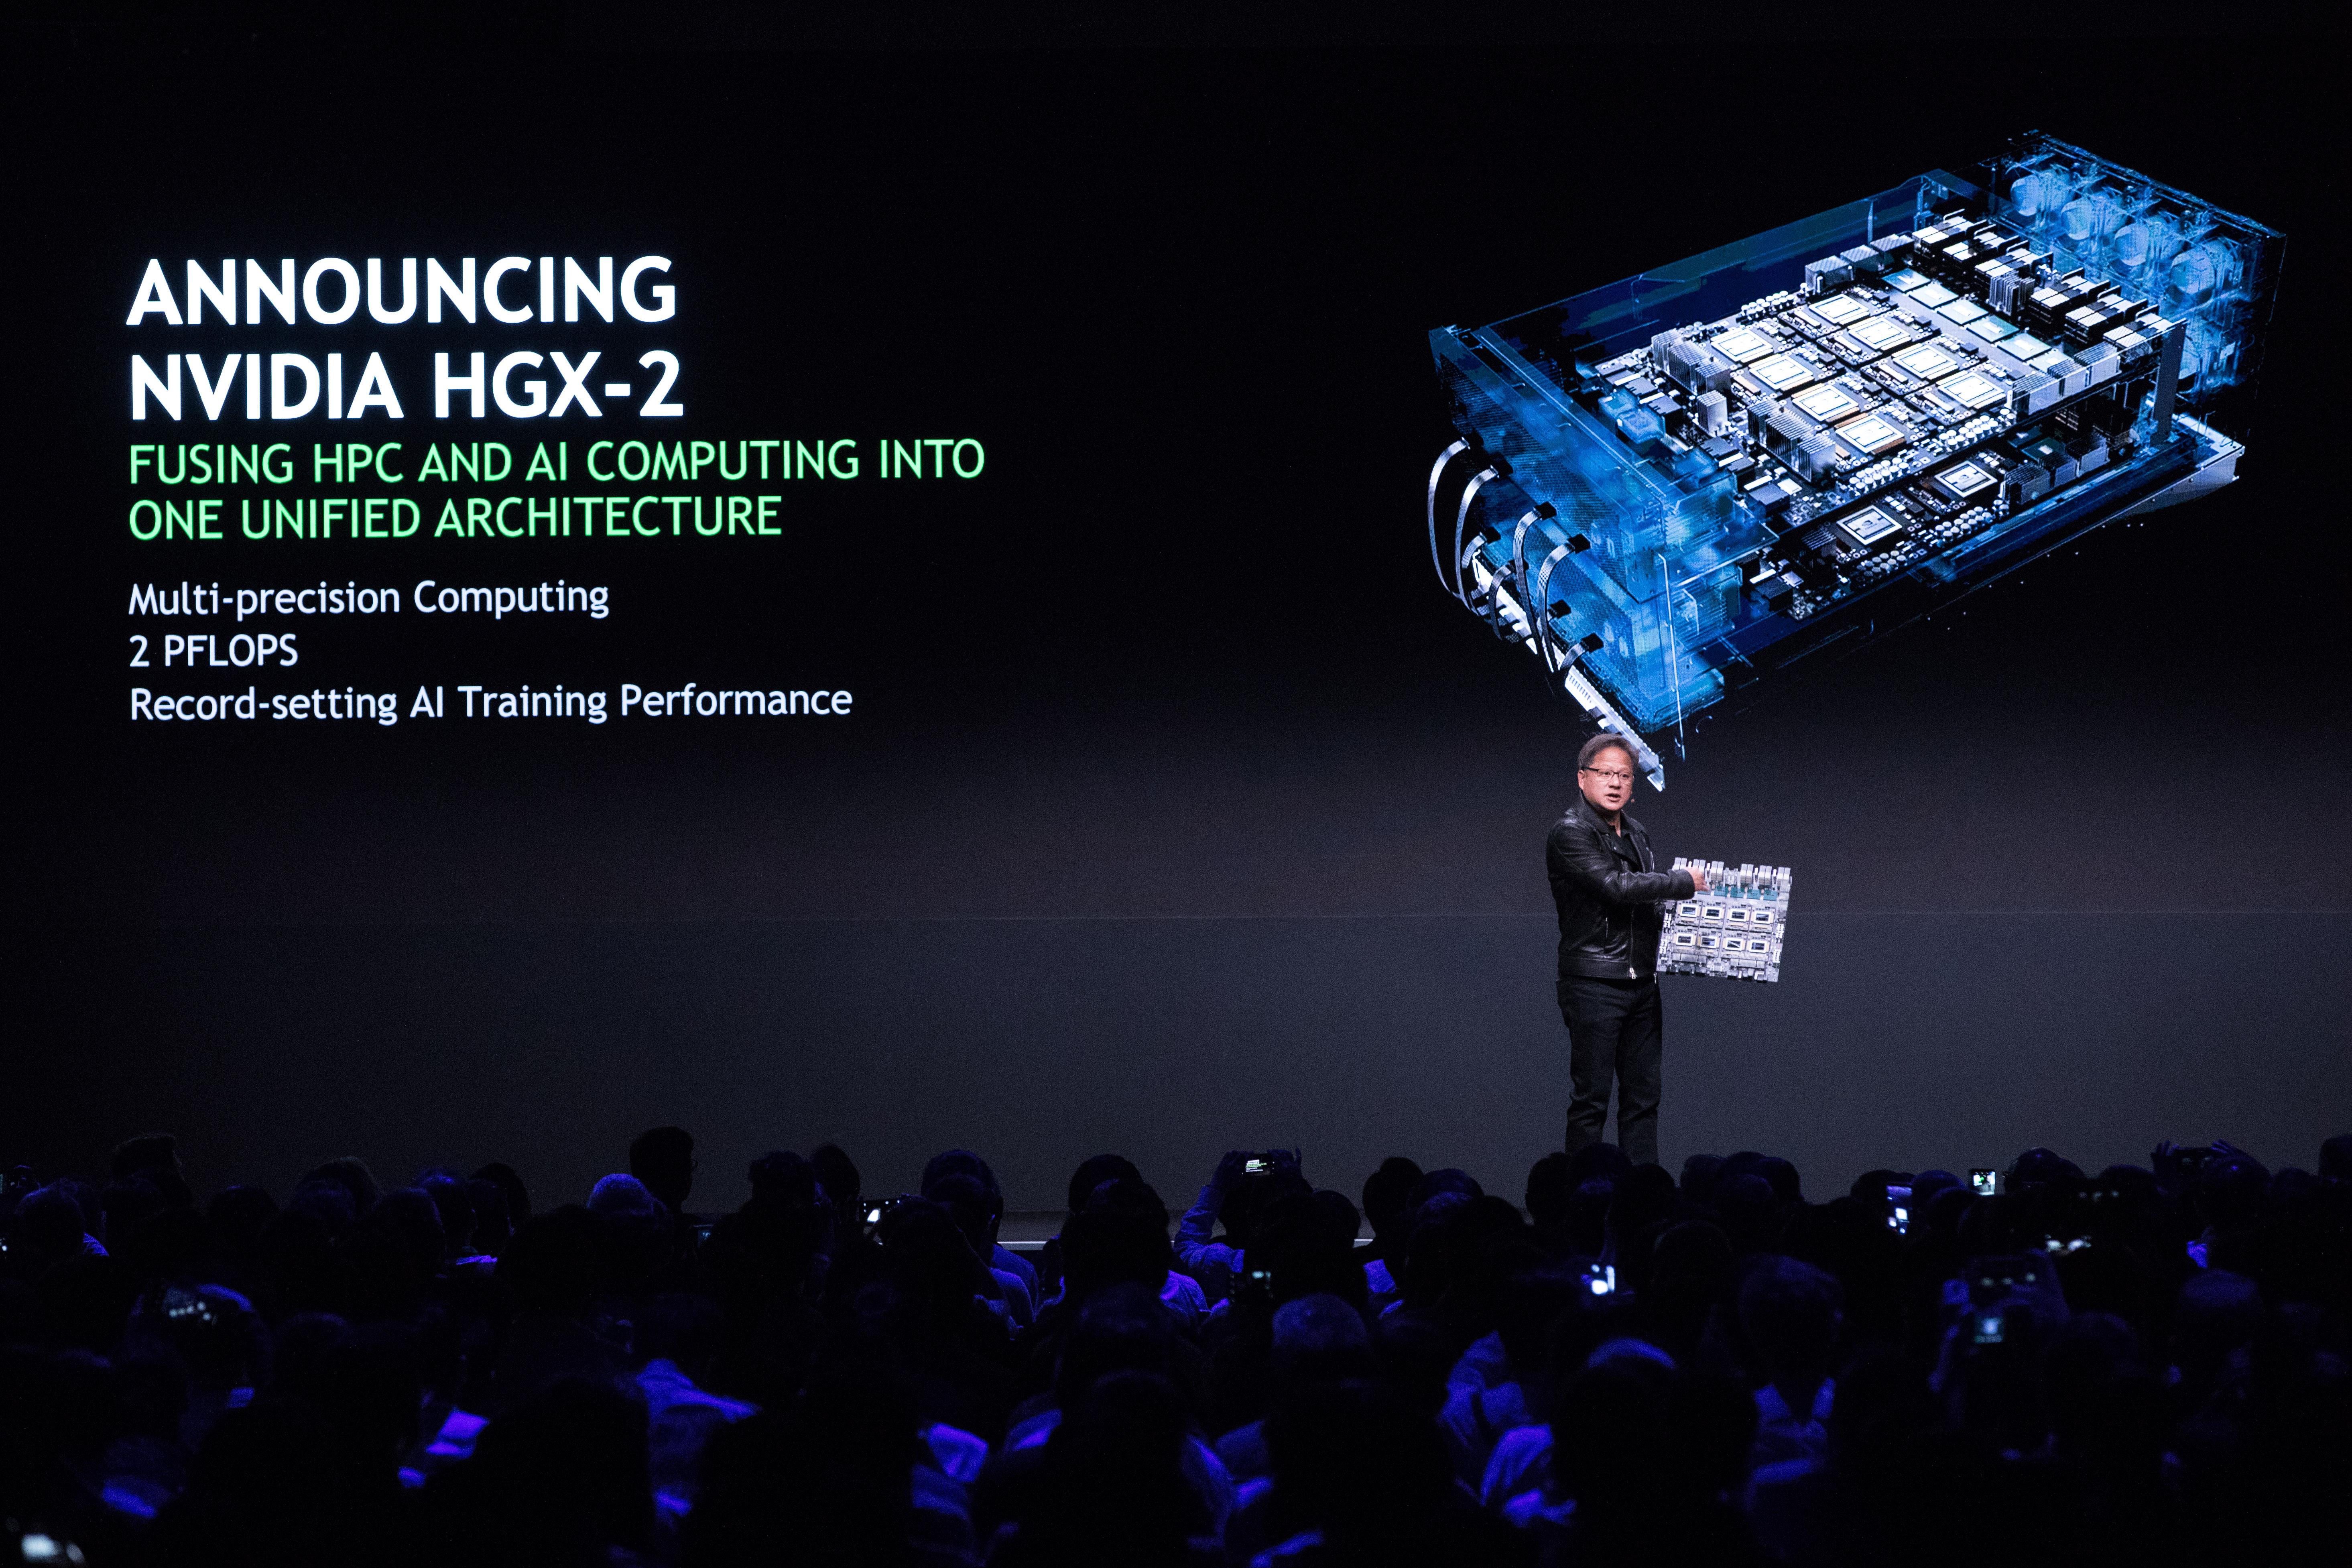 NVIDIA 为 AI 应用推出 HGX-2 云端服务器平台